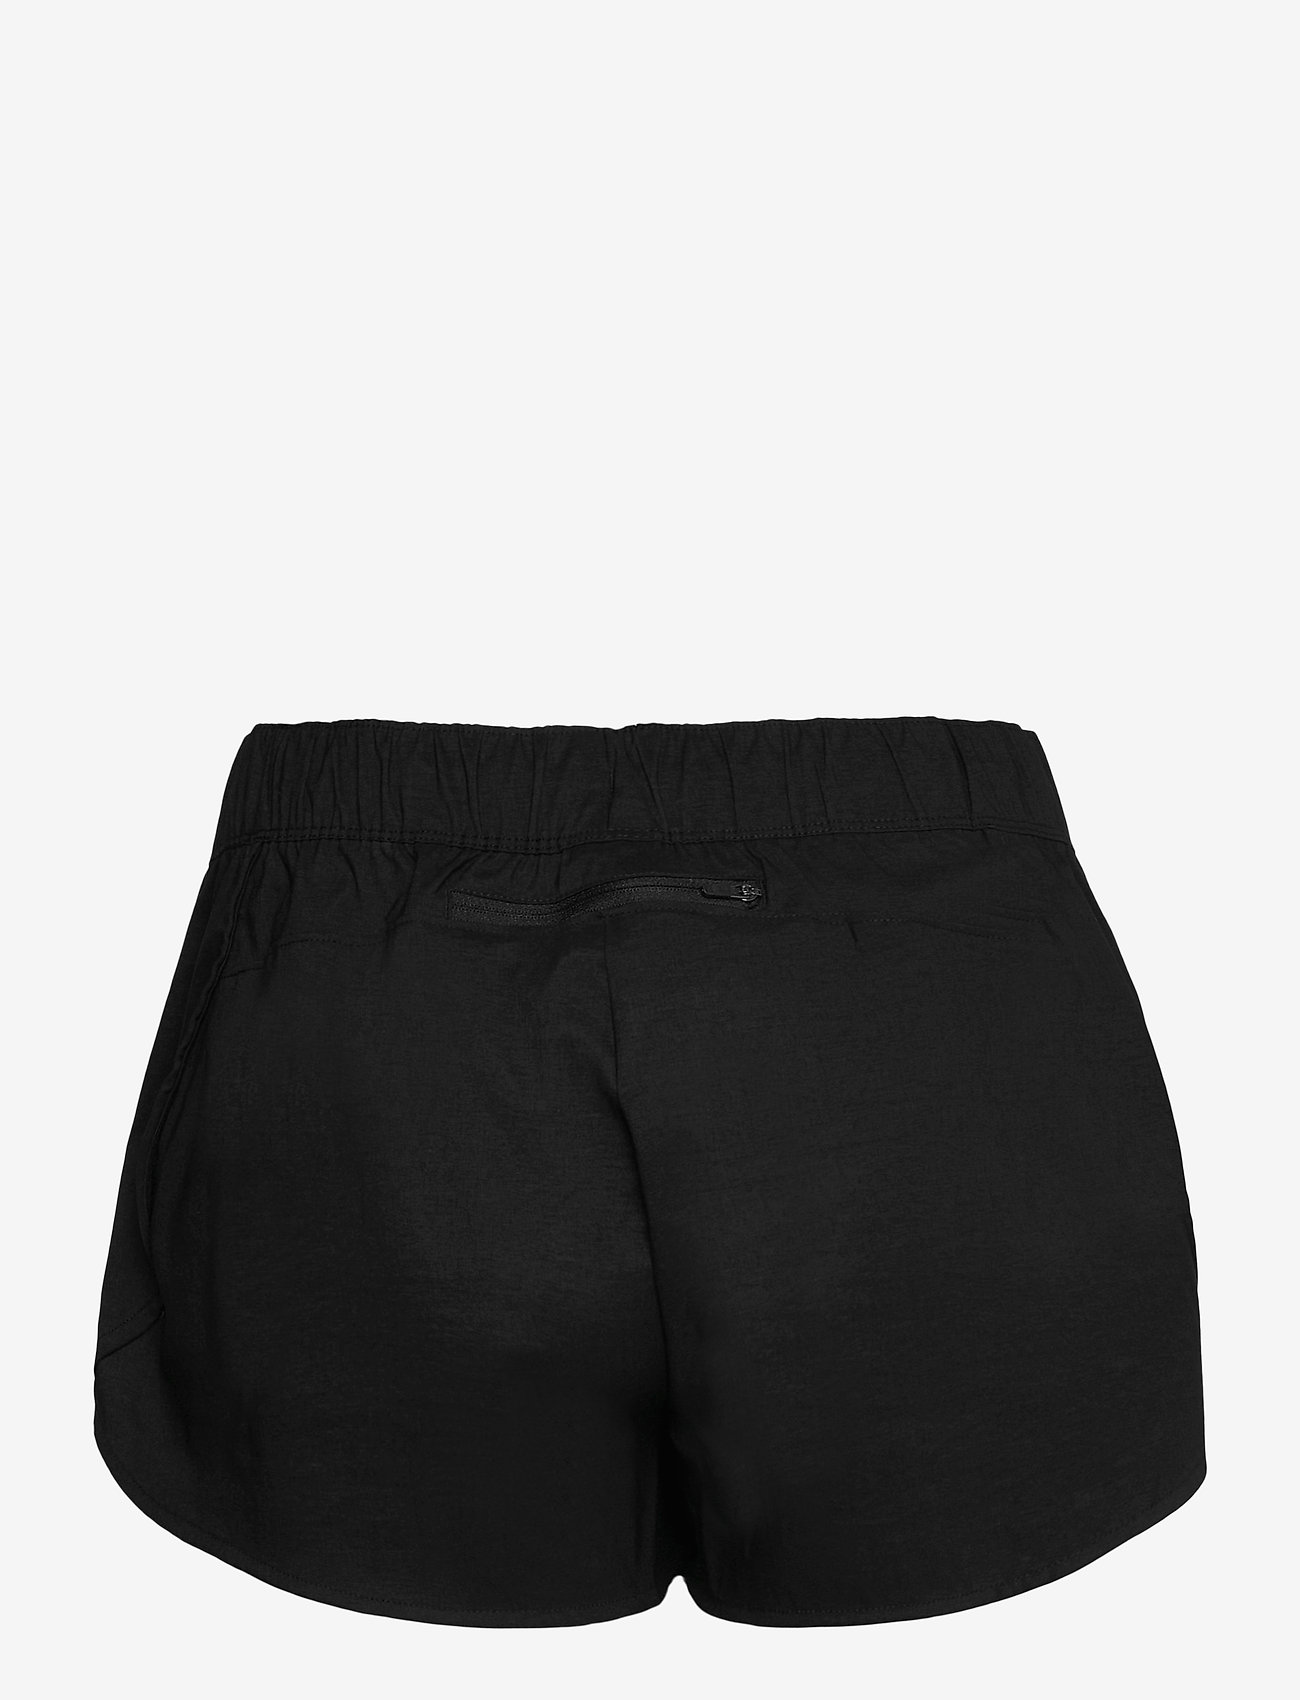 The North Face - W CLASS V MINI SHORT - wandel korte broek - tnf black - 1